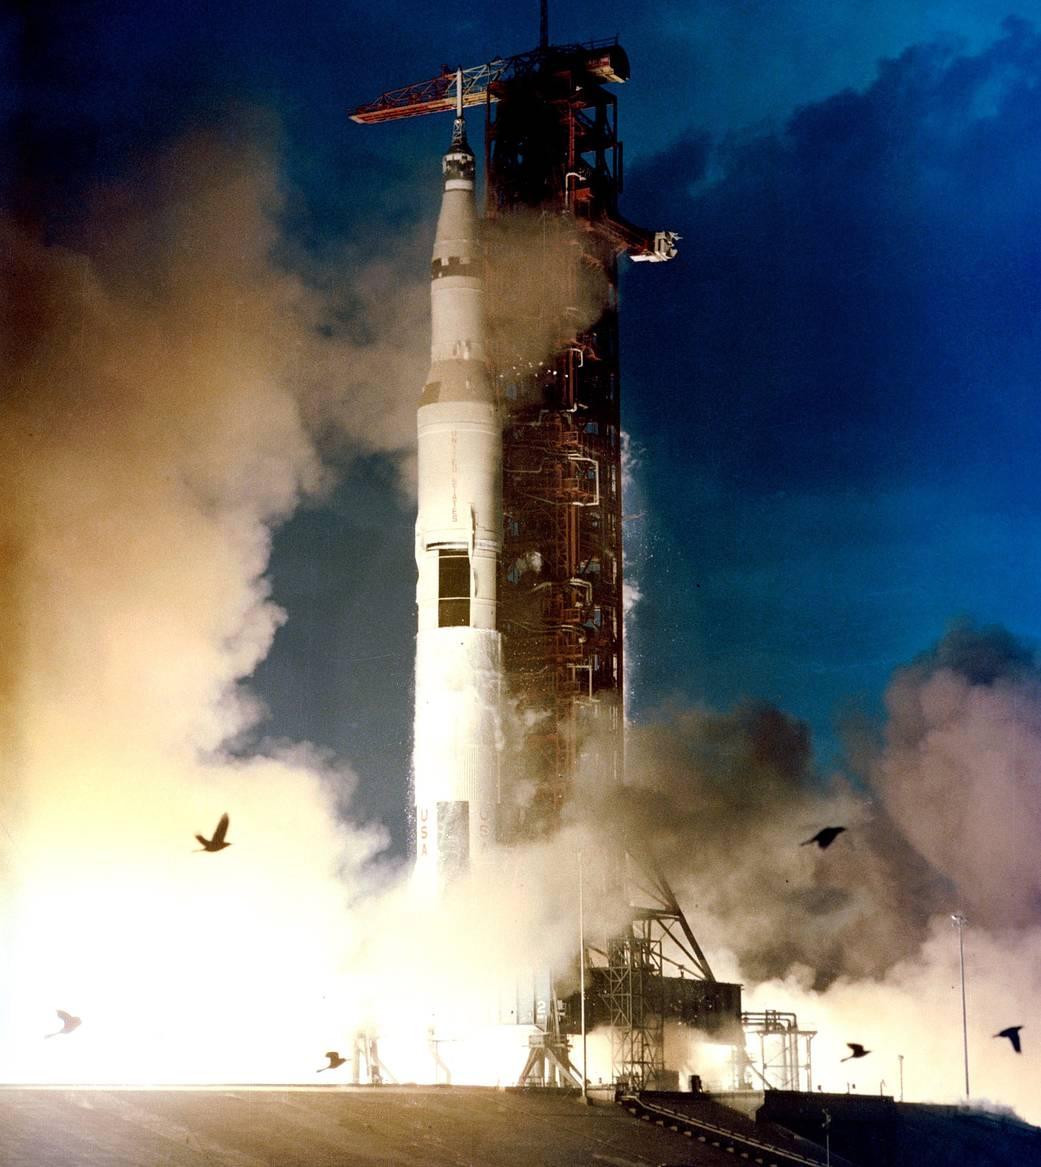 5 s71 18395b آپولو ۱۴: ماموریتی که برنامه فضایی آمریکا را نجات داد اخبار IT